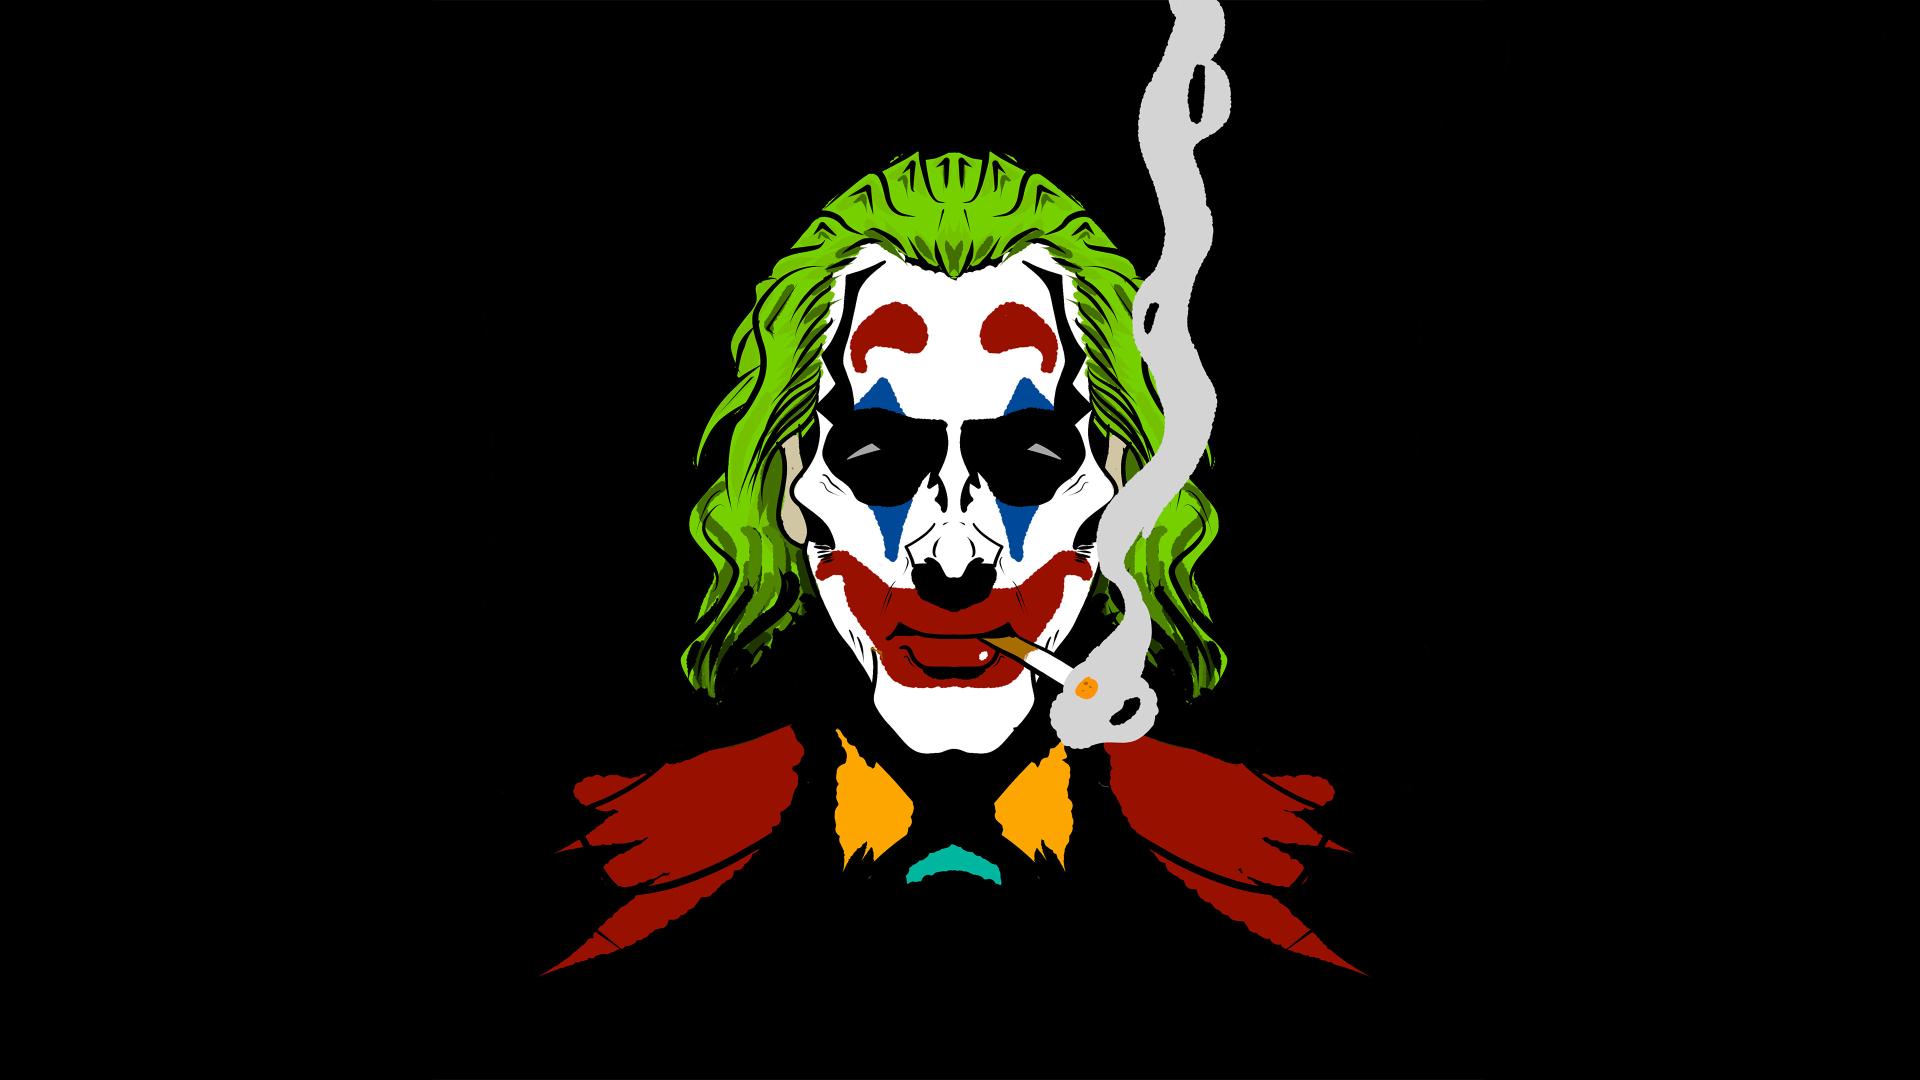 1920x1080 Joker Smoking 1080P Laptop Full HD Wallpaper, HD ...